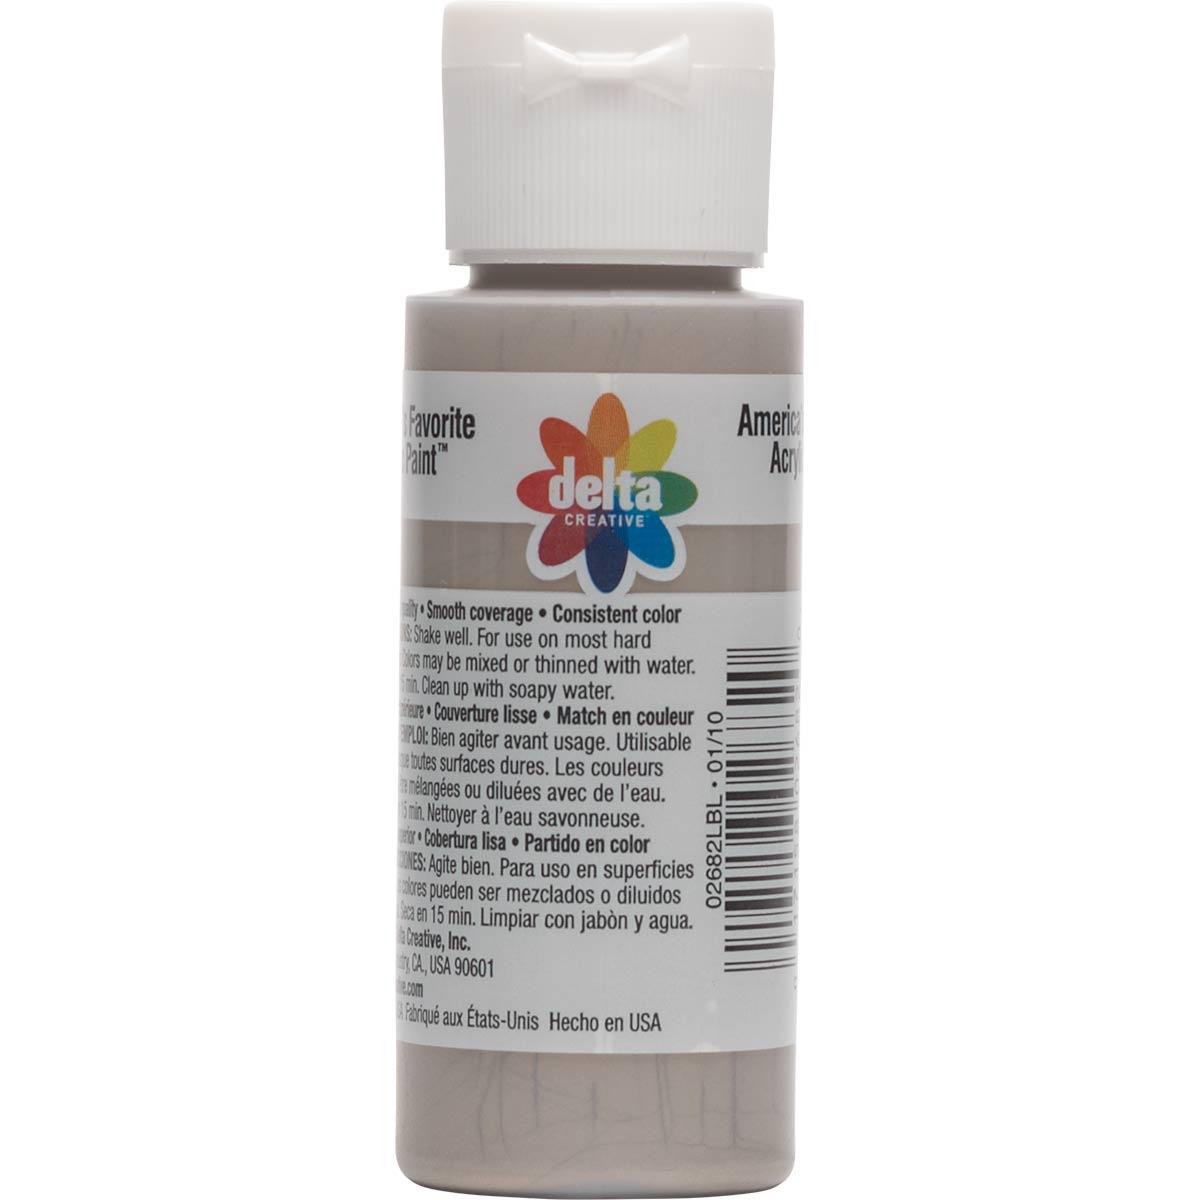 Delta Ceramcoat ® Acrylic Paint - Metallic Aluminum, 2 oz. - 026820202W